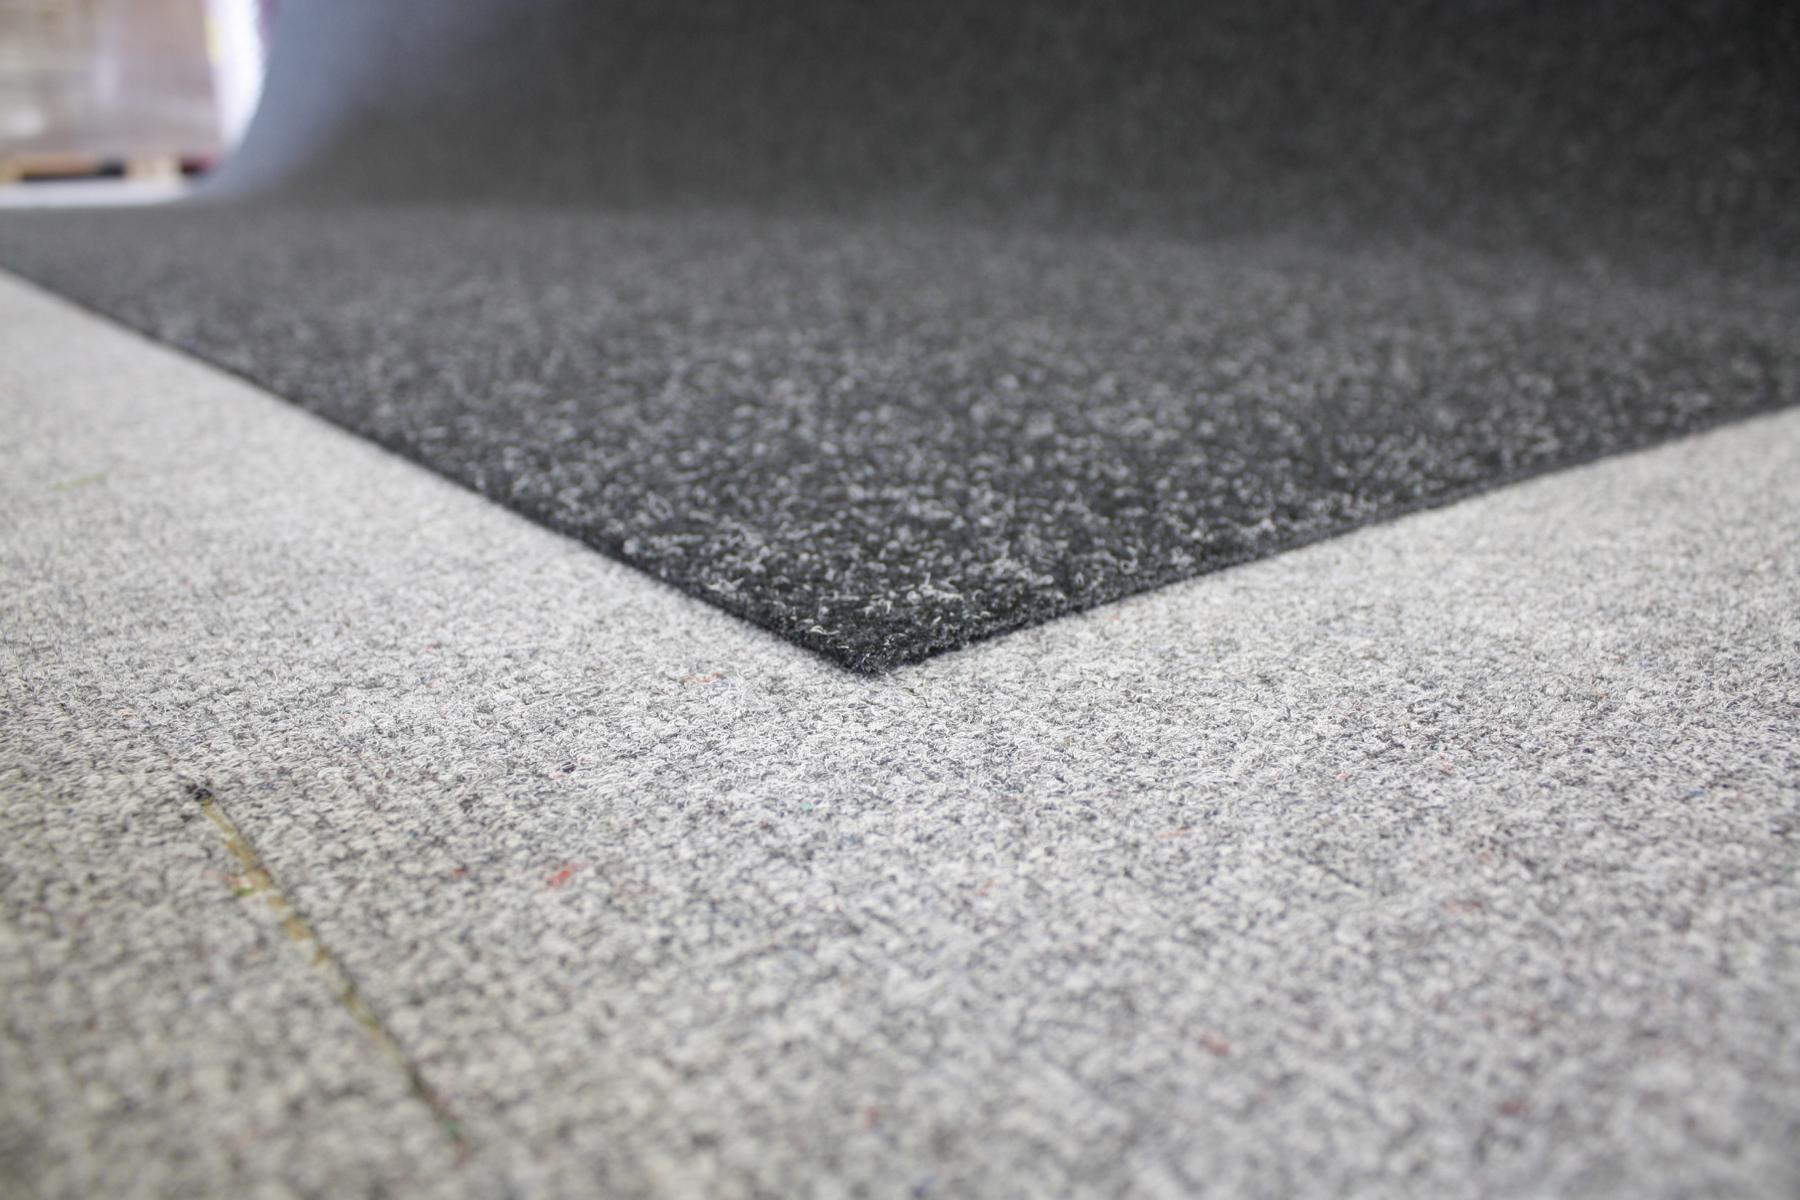 teppichboden nadelvlies nadelfilz merlin b1 schwarz 500x400 cm ebay. Black Bedroom Furniture Sets. Home Design Ideas